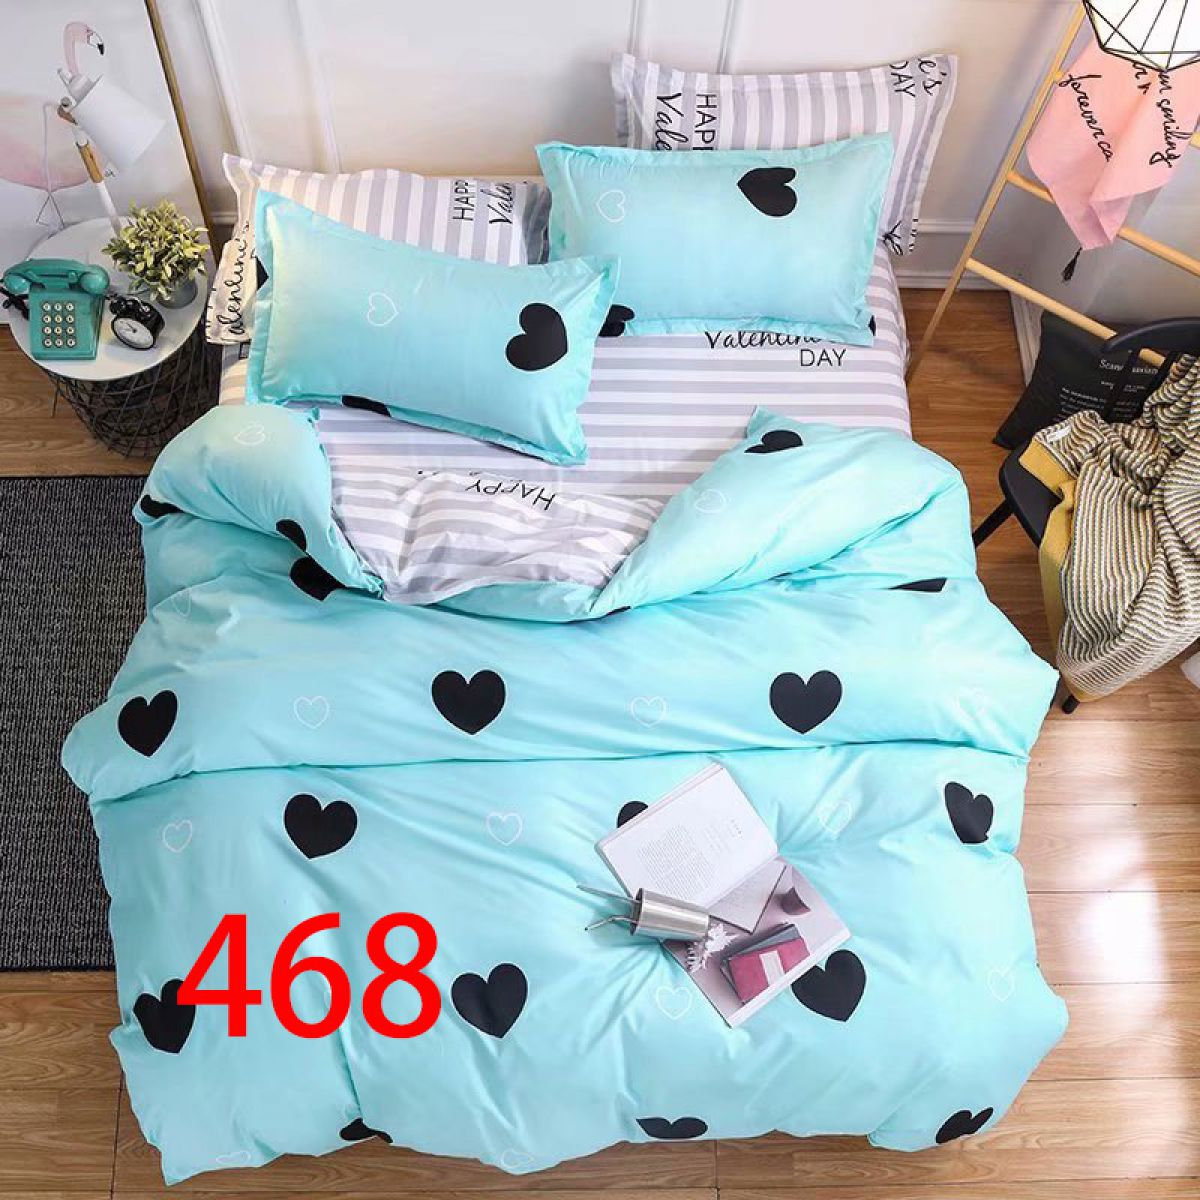 3D Beddings - Antonio - AML-4248 - 160x200 cm - 3 pcs